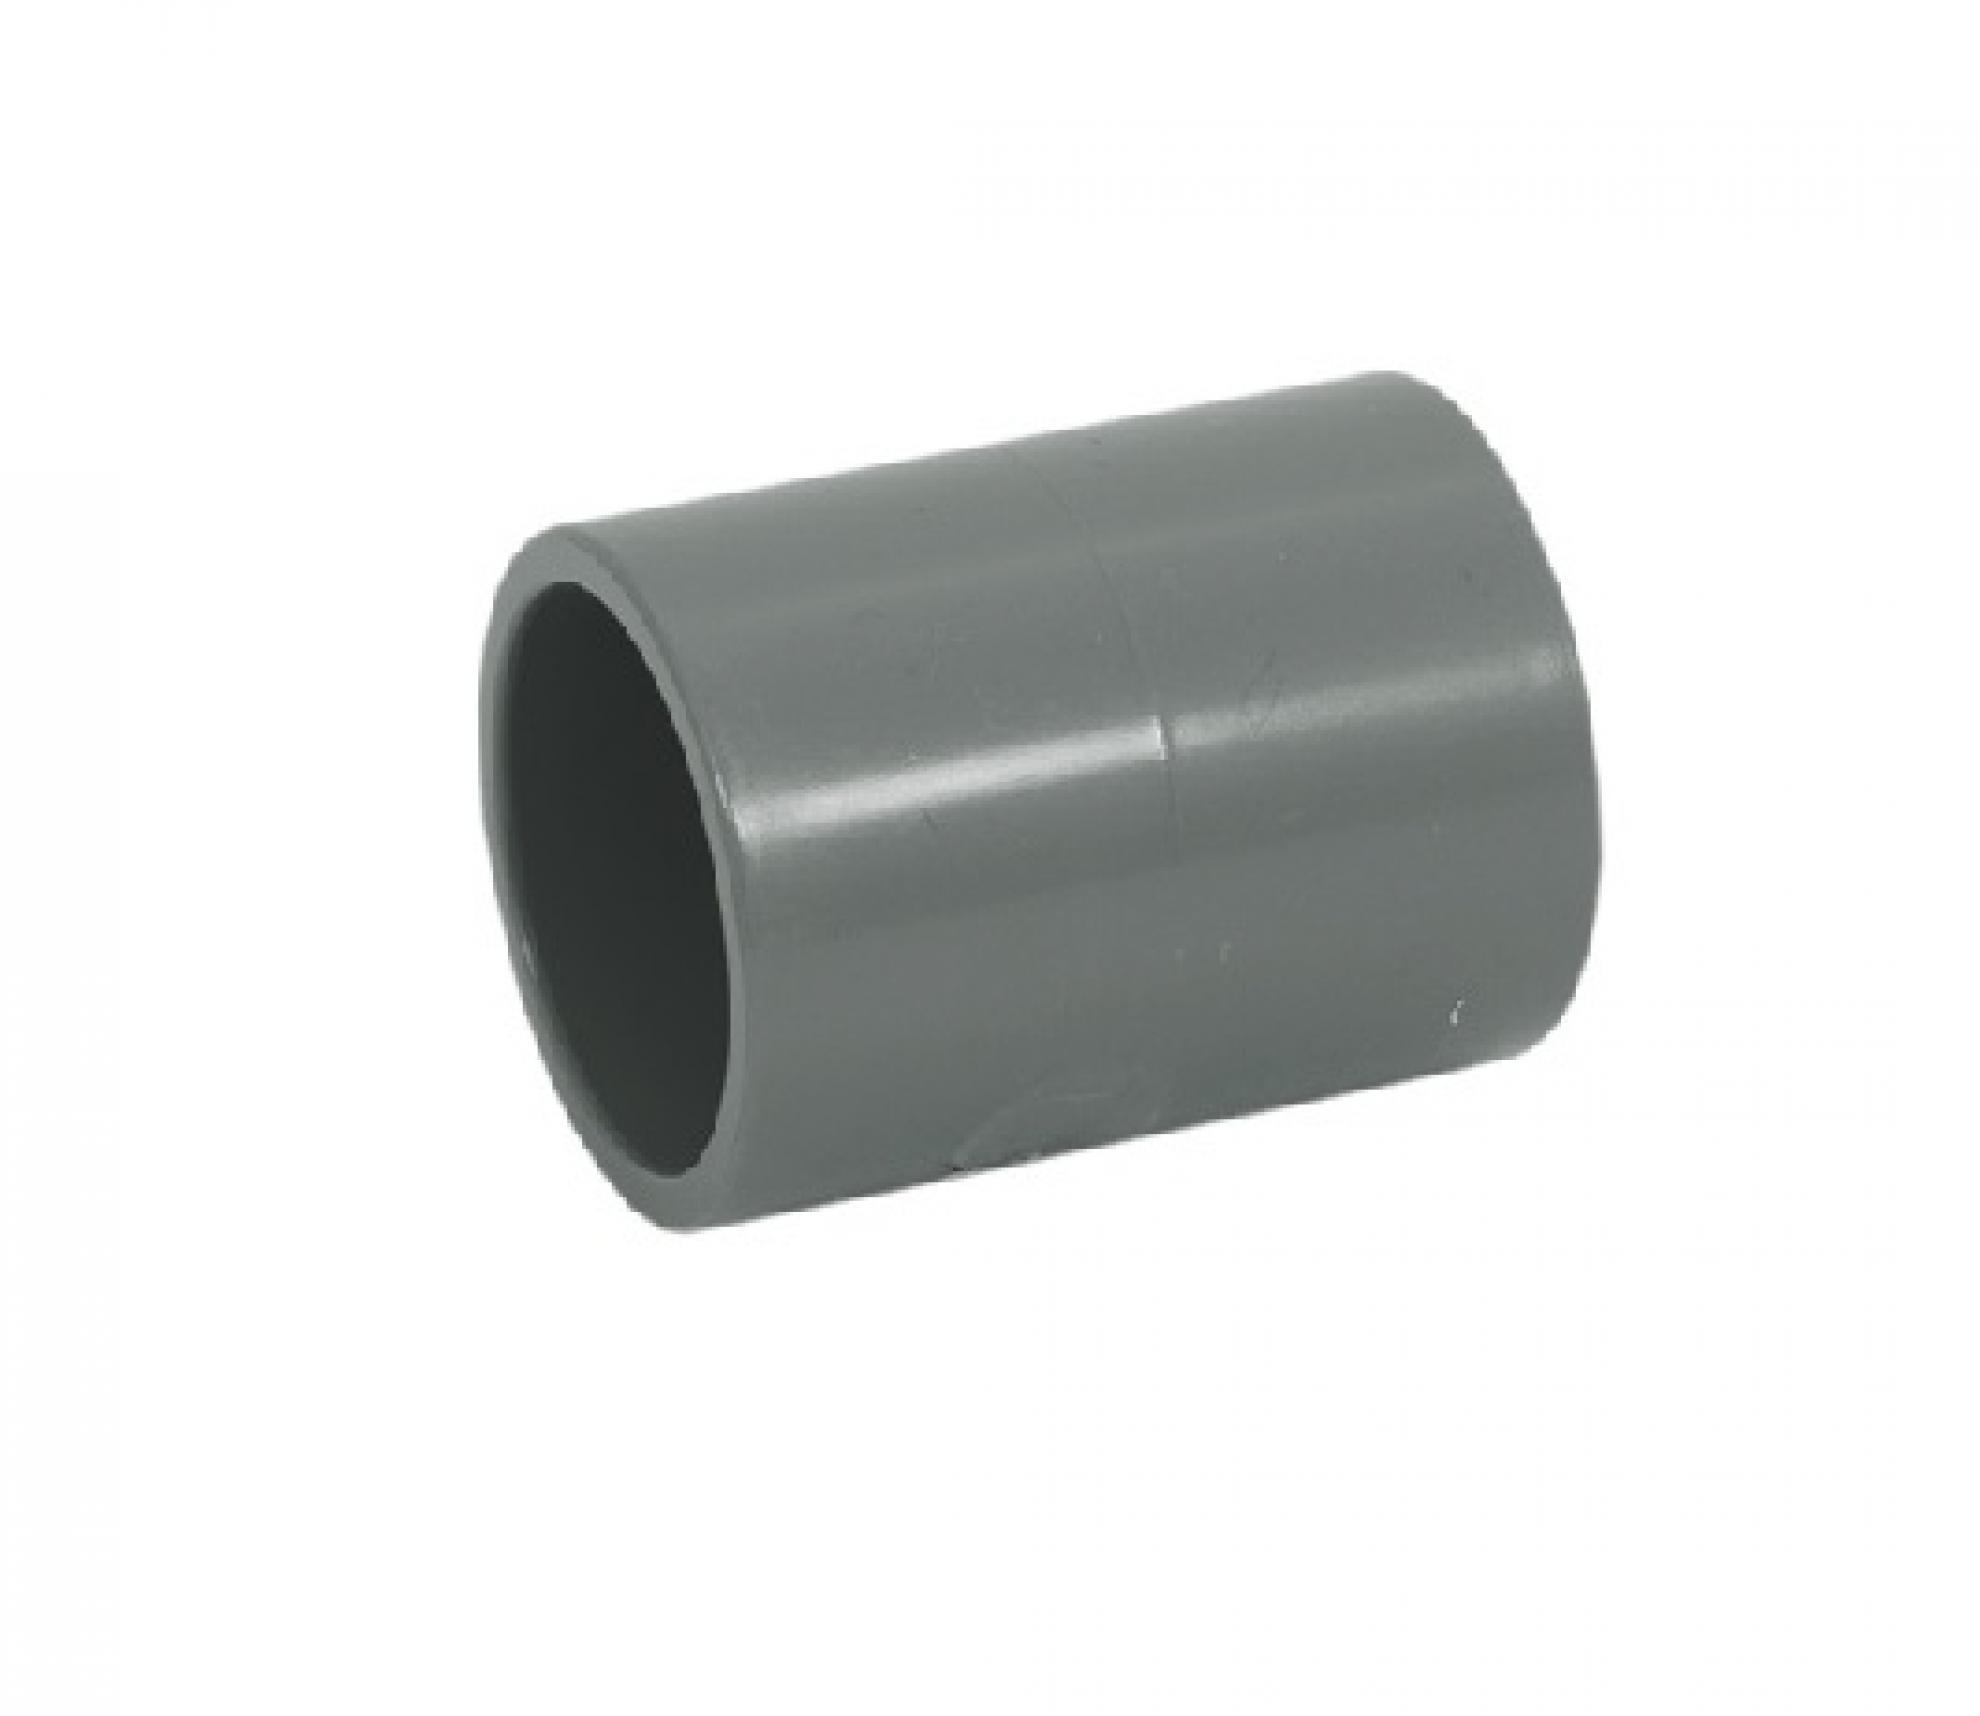 "Luva PVC 3/4"" polegadas encaixe - Cinza"